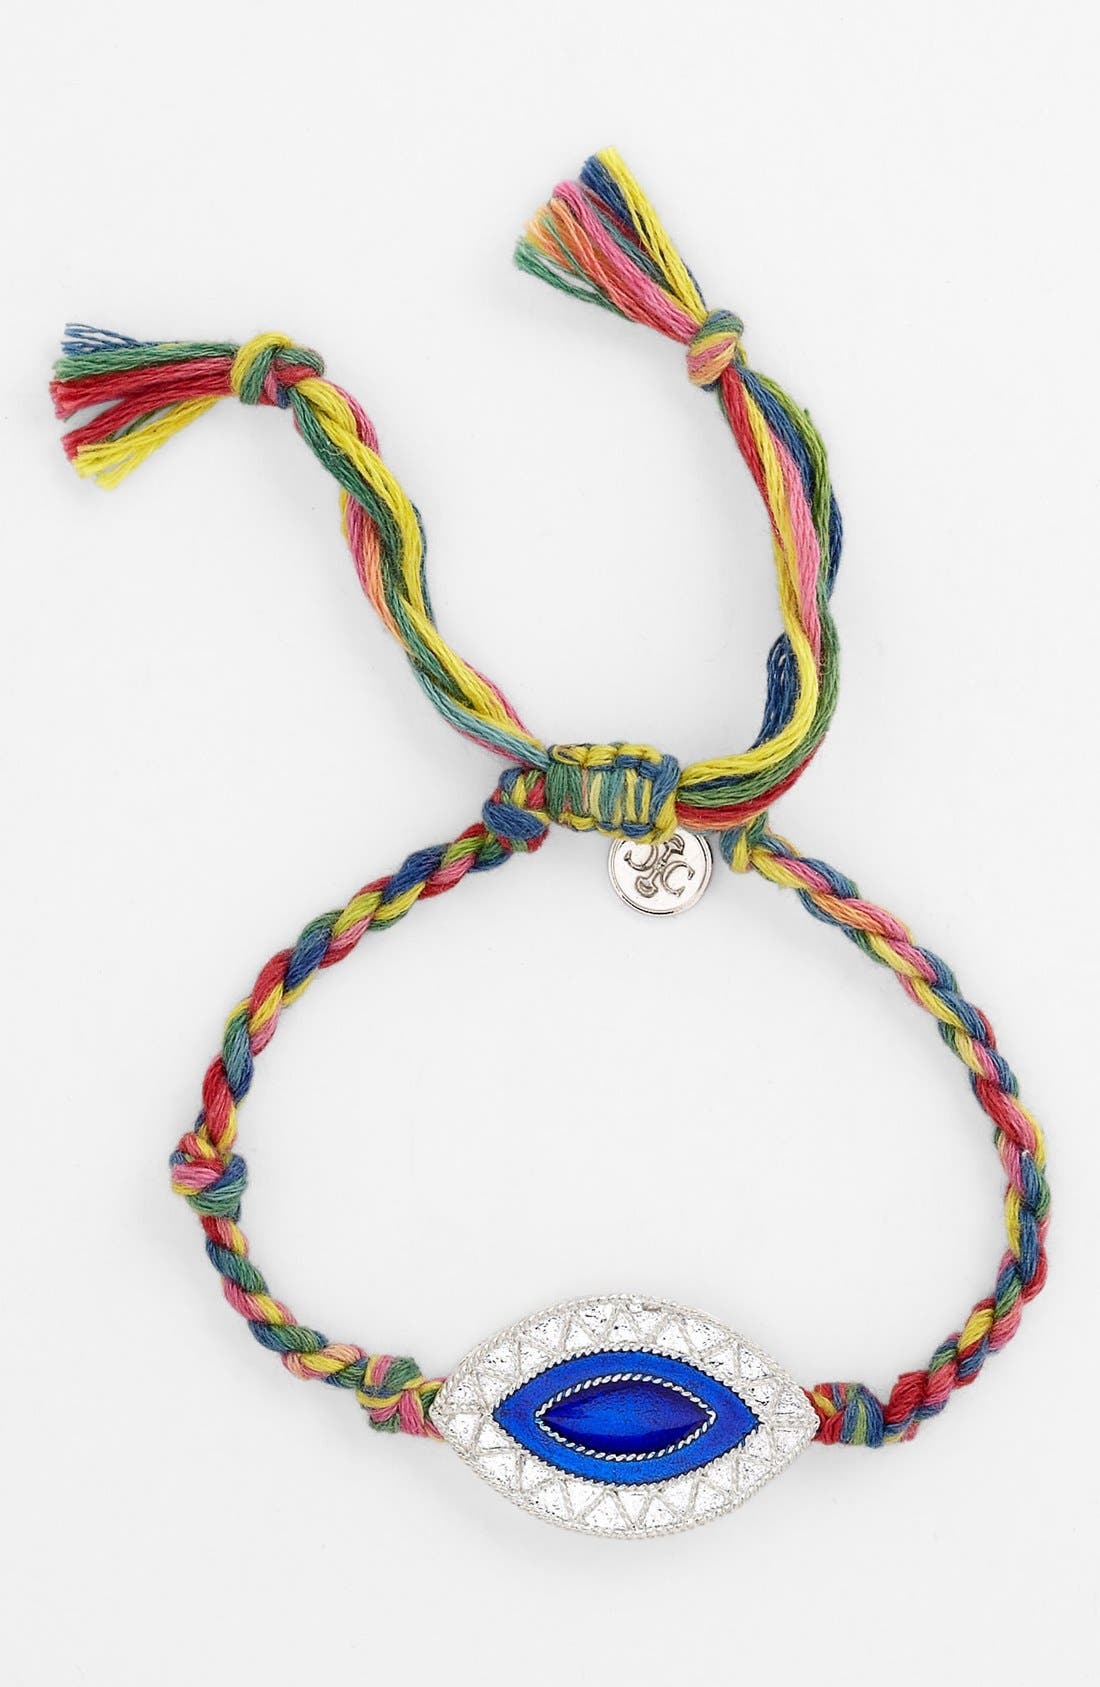 Alternate Image 1 Selected - Carbon Copy Jewelry 'Evil Eye' Braided Bracelet